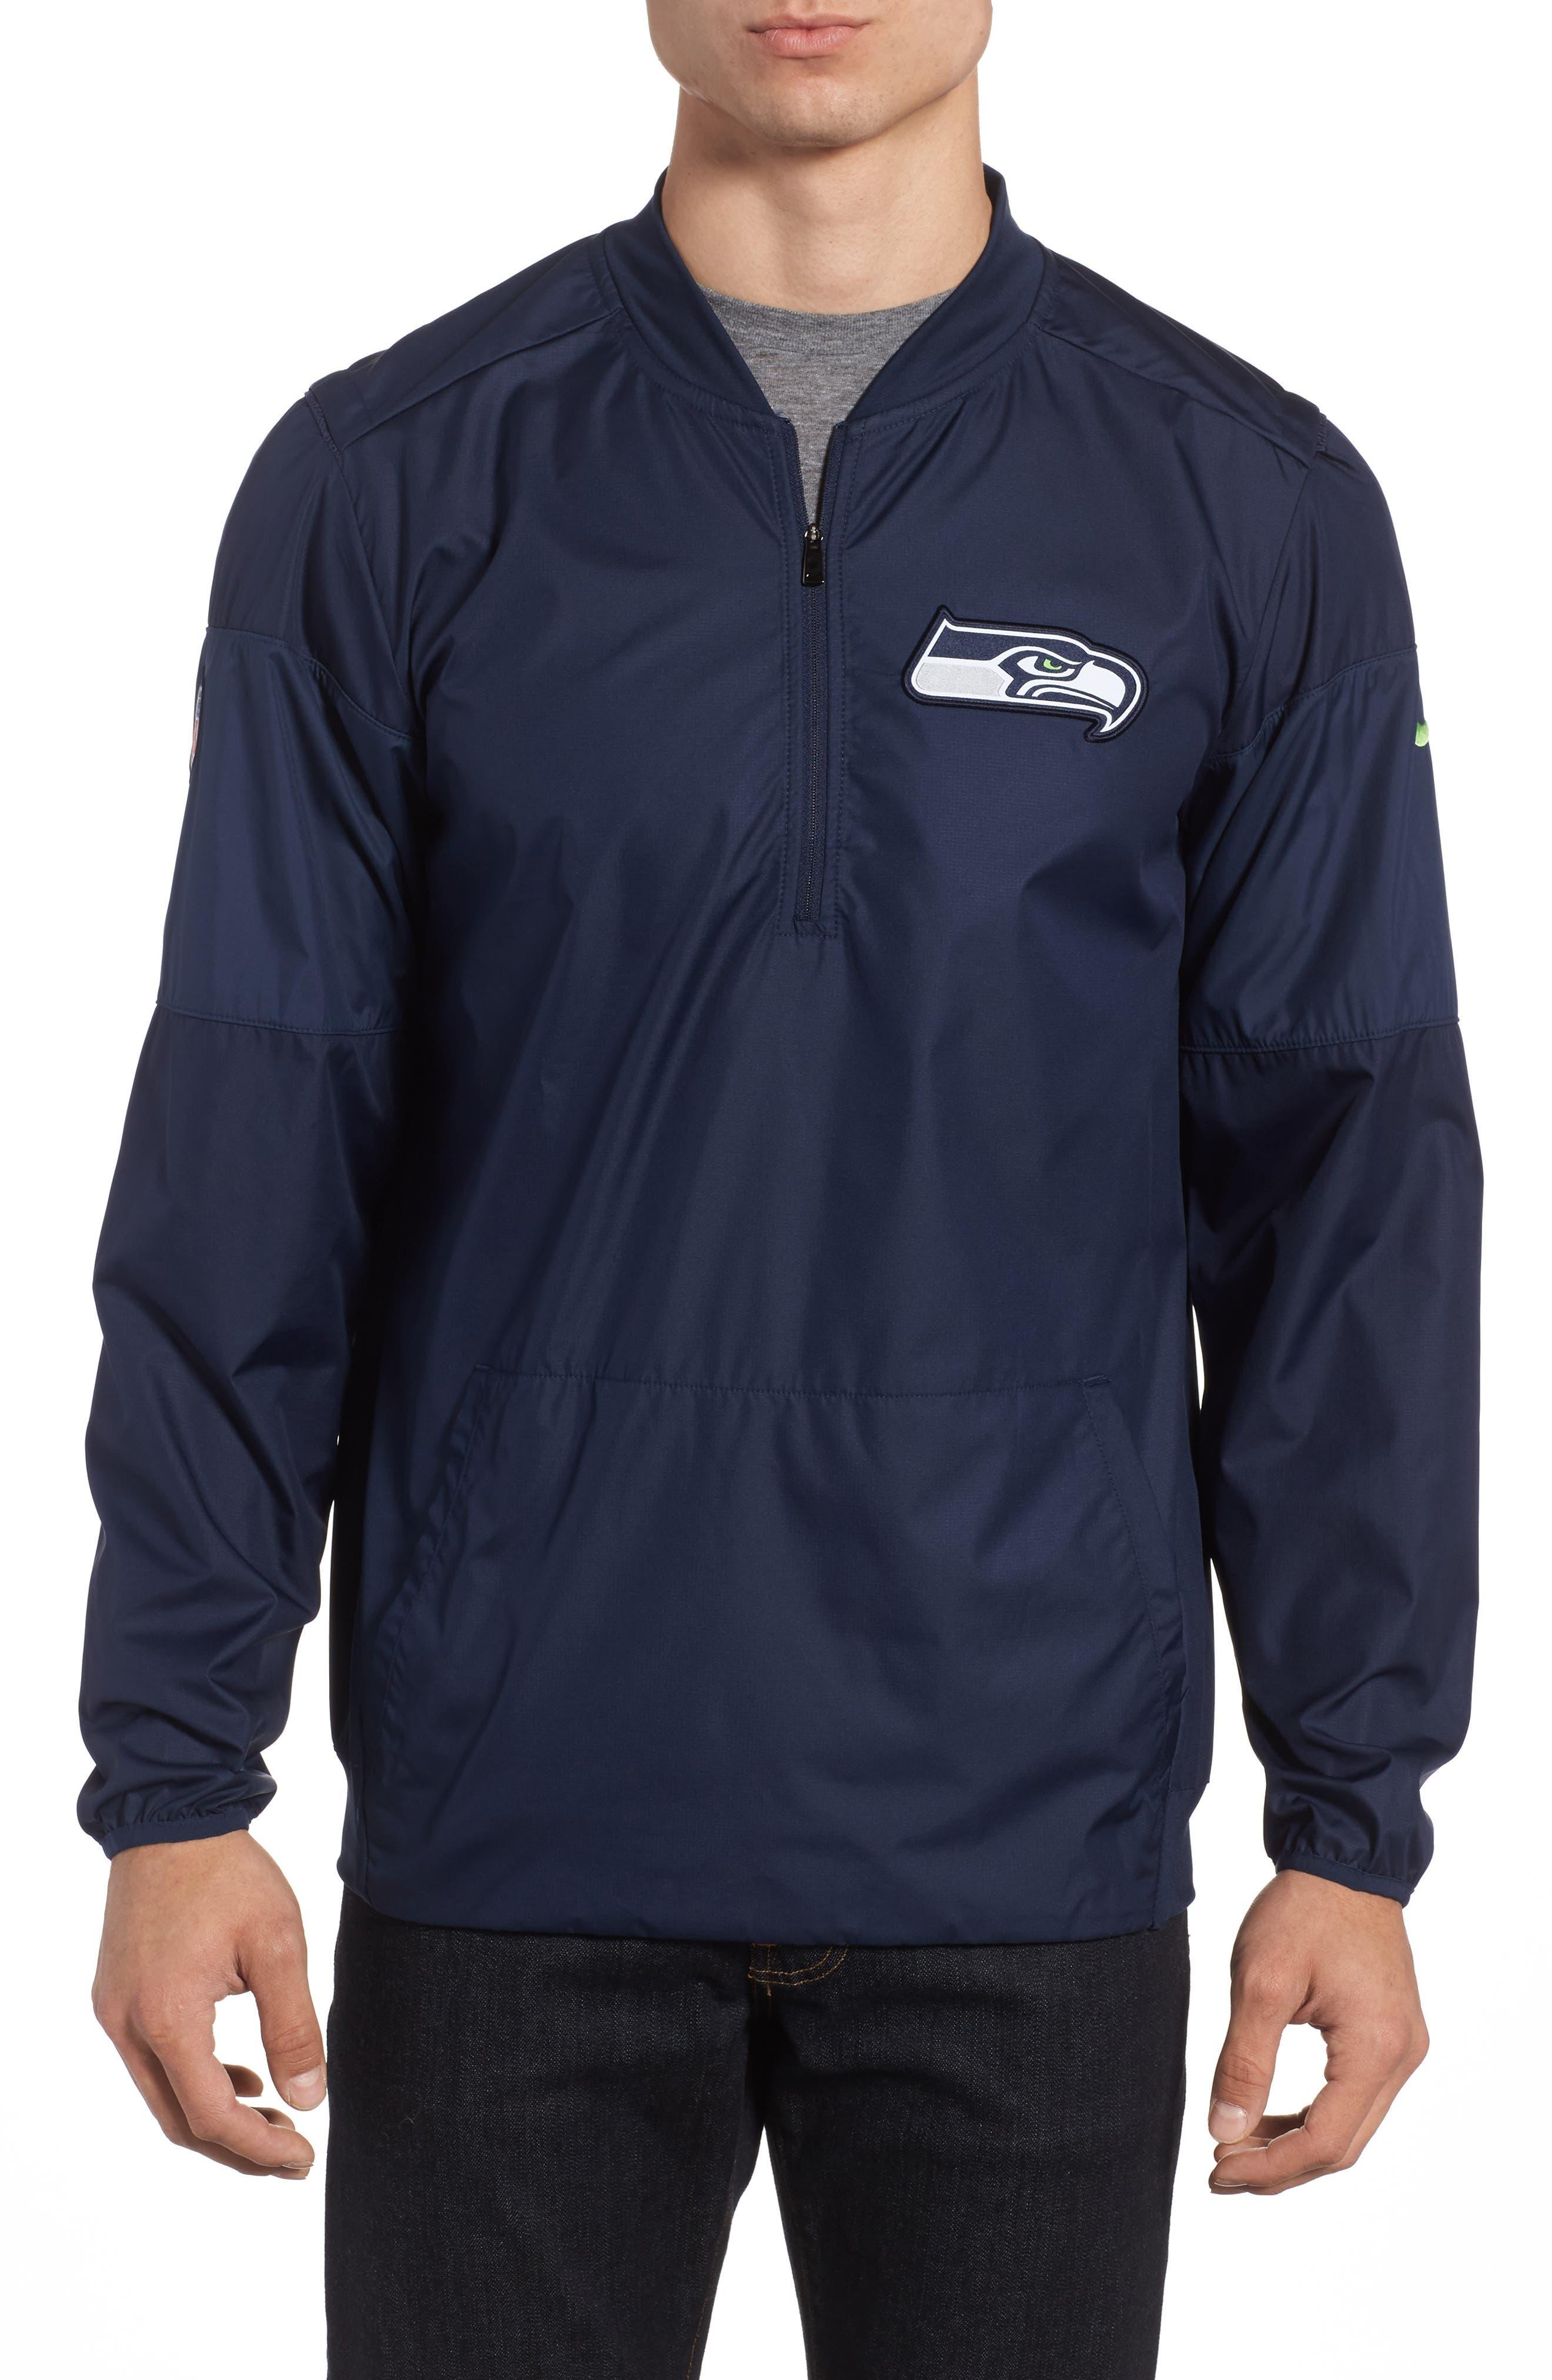 Lockdown NFL Pullover Jacket,                             Main thumbnail 4, color,